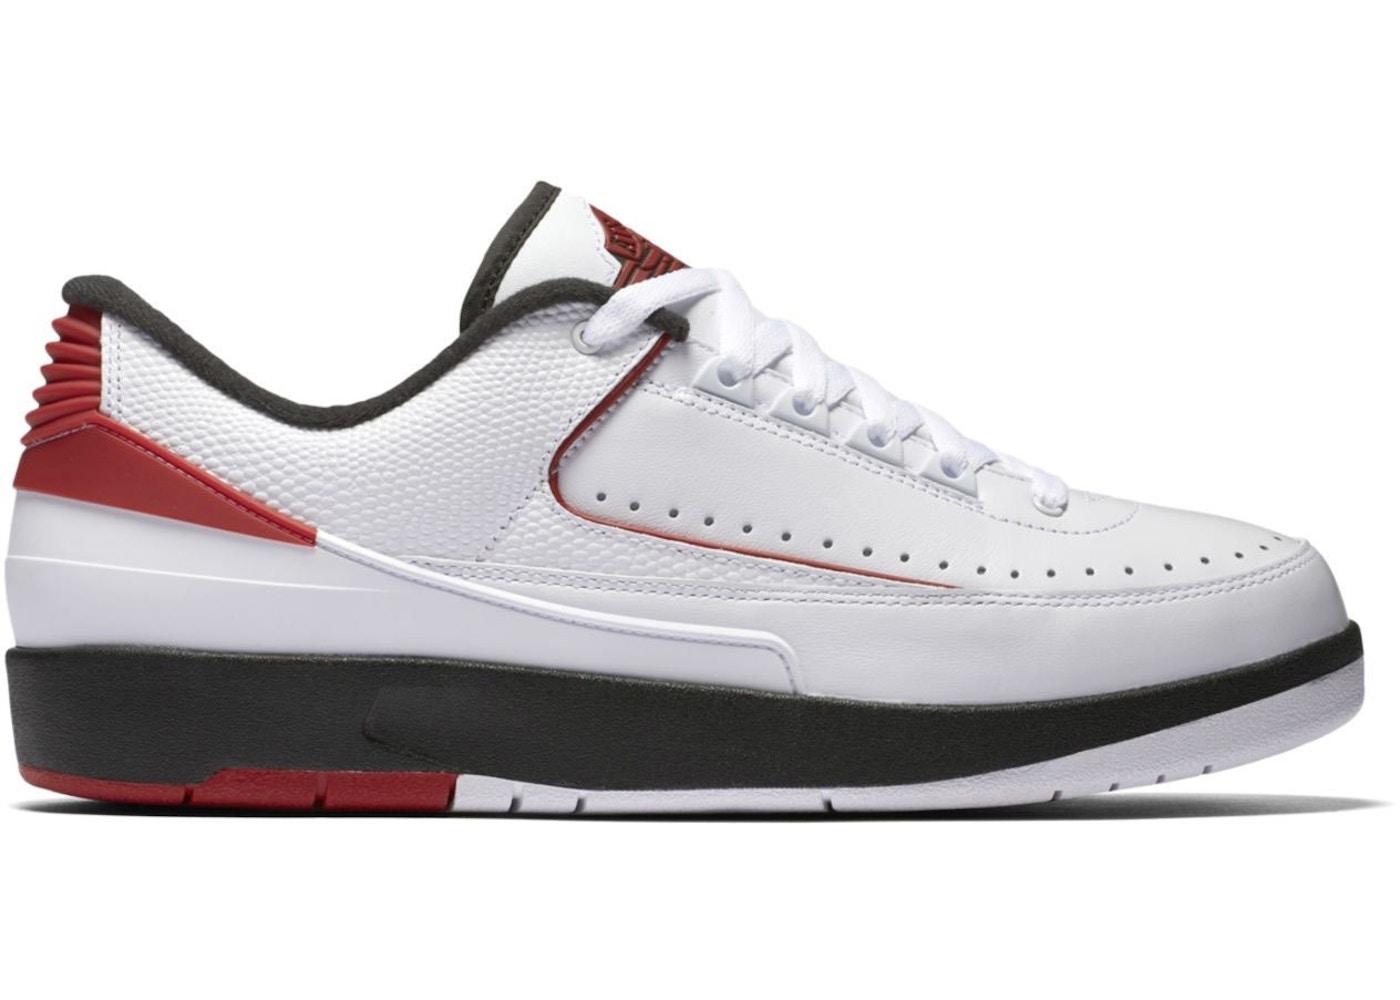 1606f8e187b3bd Air Jordan 2 Shoes - Release Date